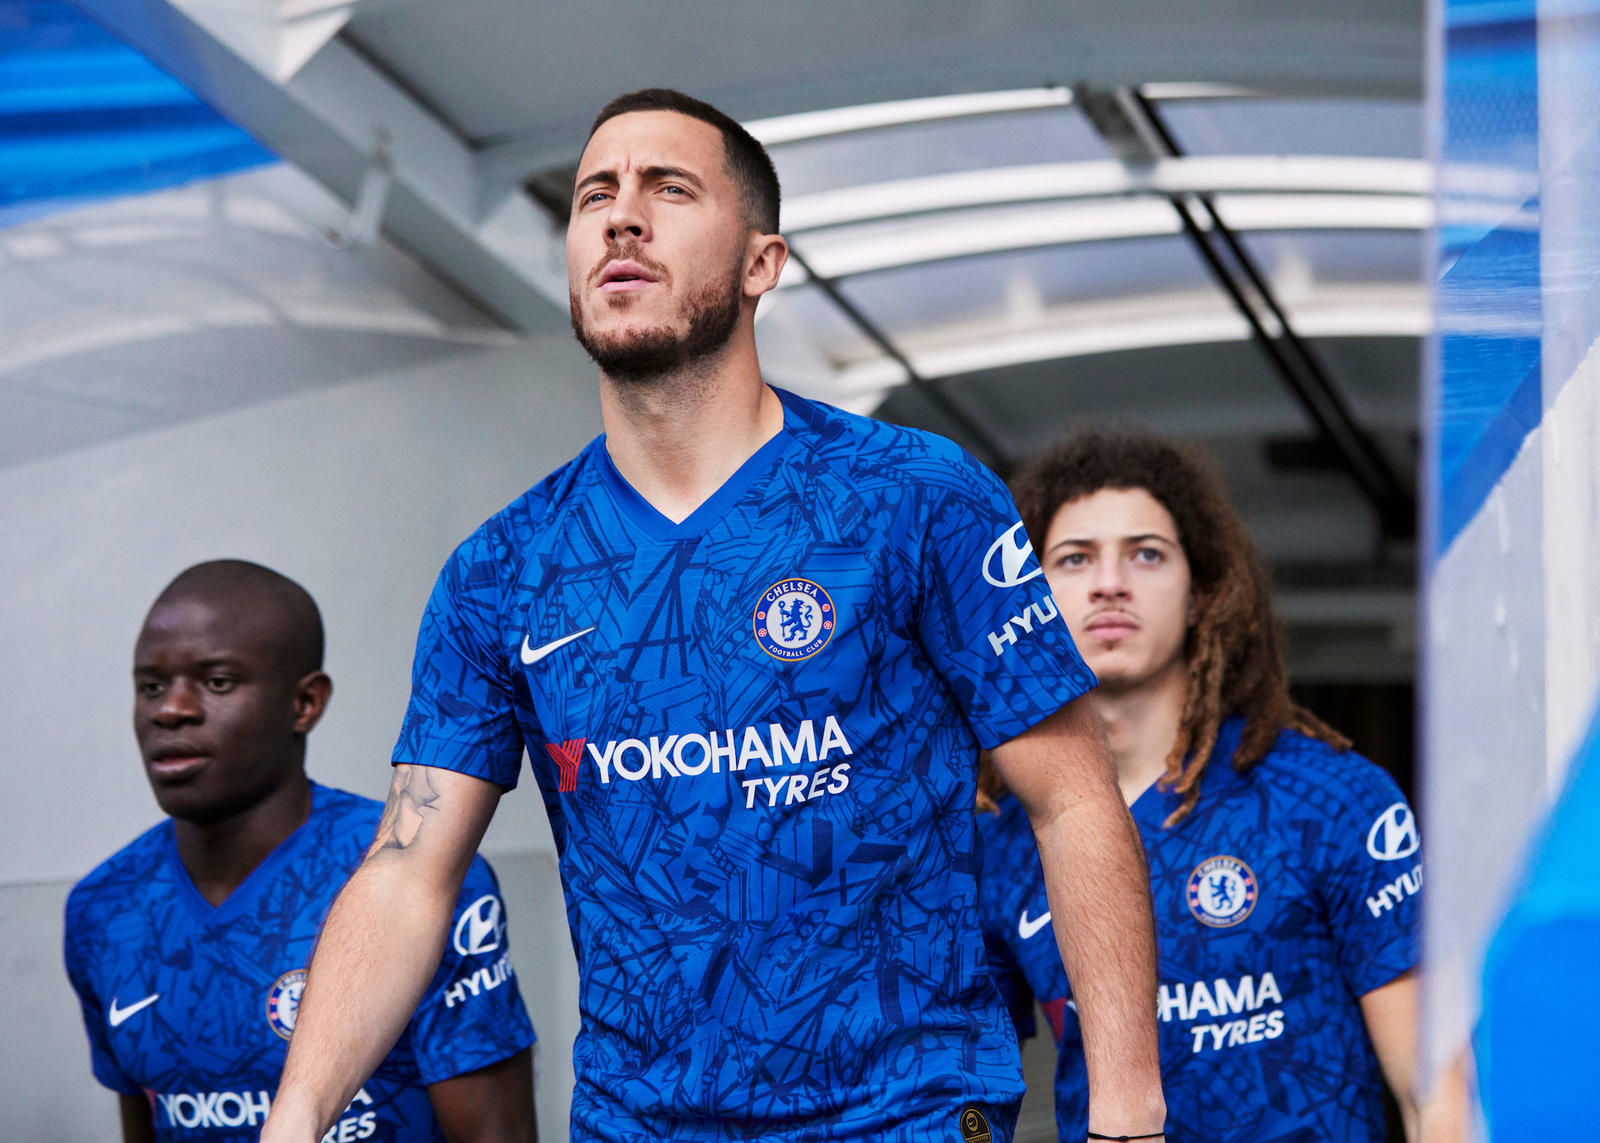 Nike_ChelseaFC_HomeKit_2019-20_3_SS_rectangle_1600.jpg